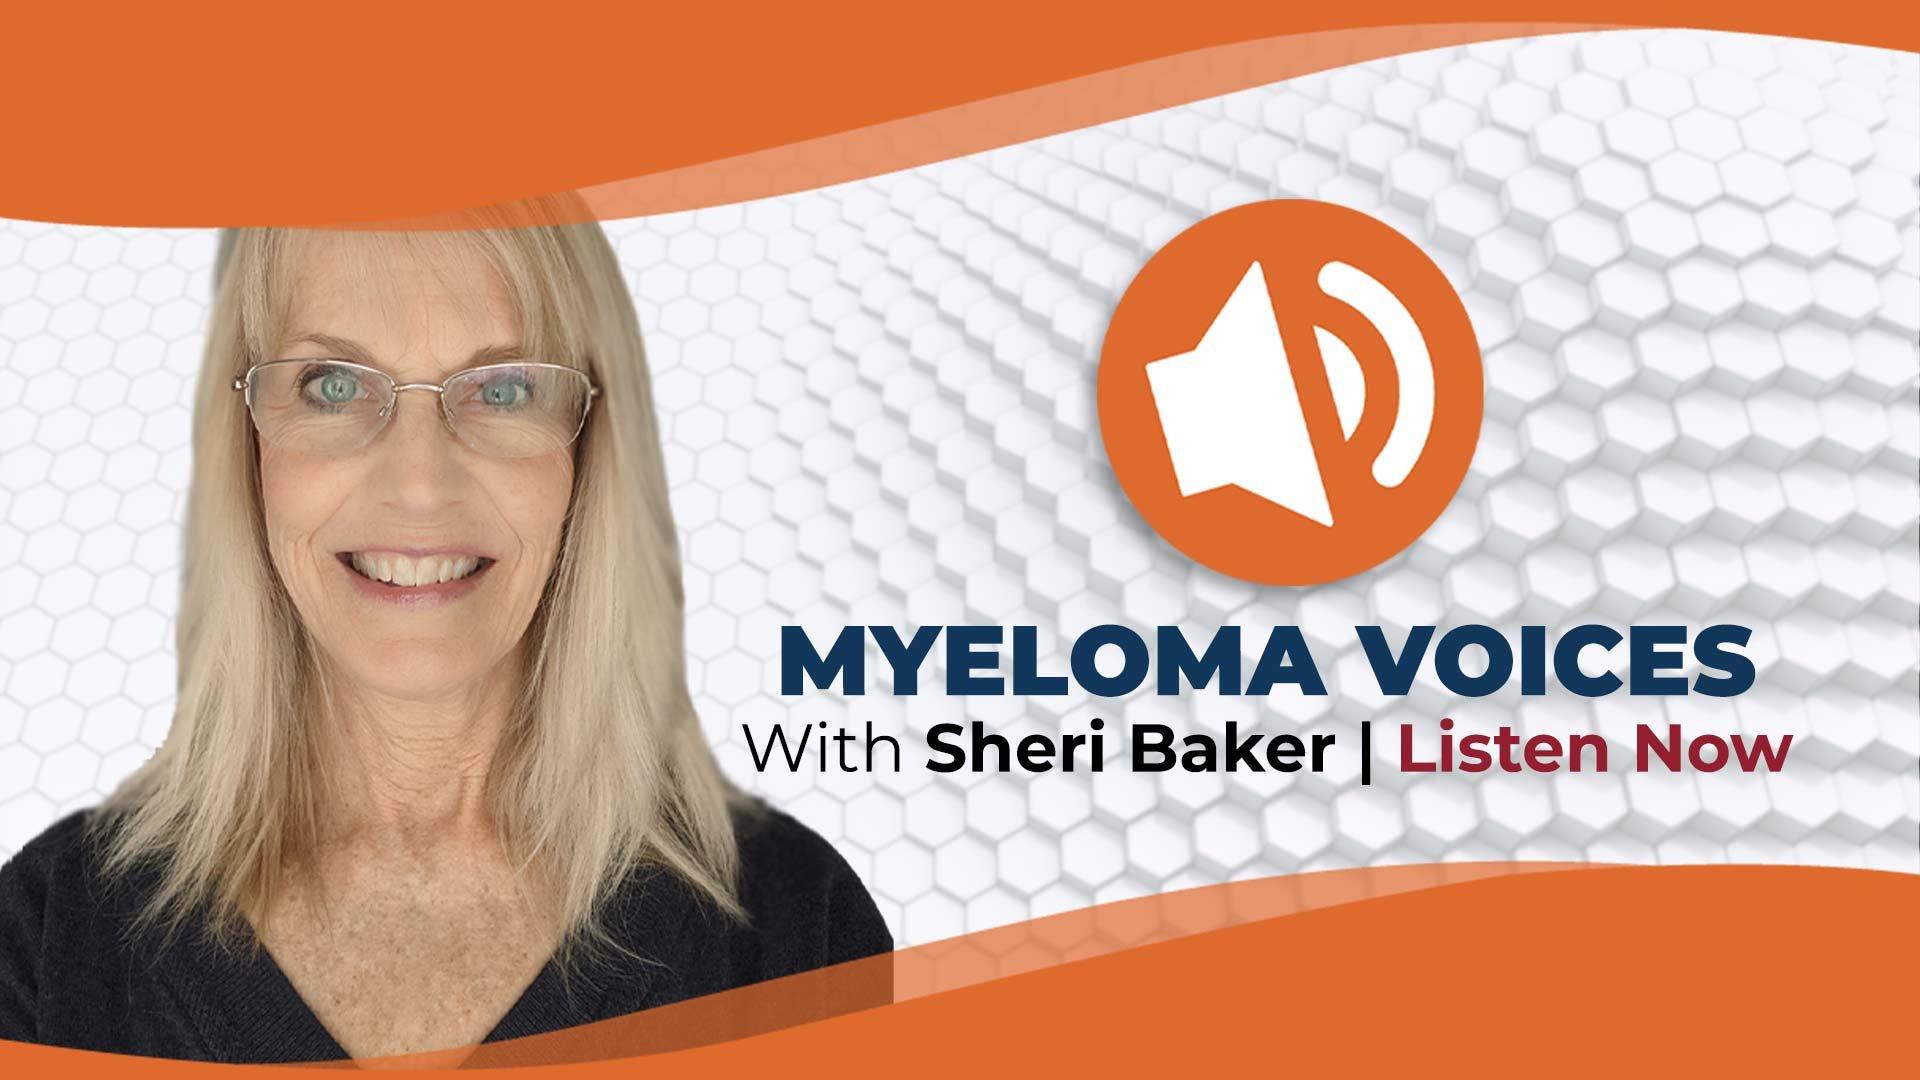 Myeloma Voices Sheri Baker